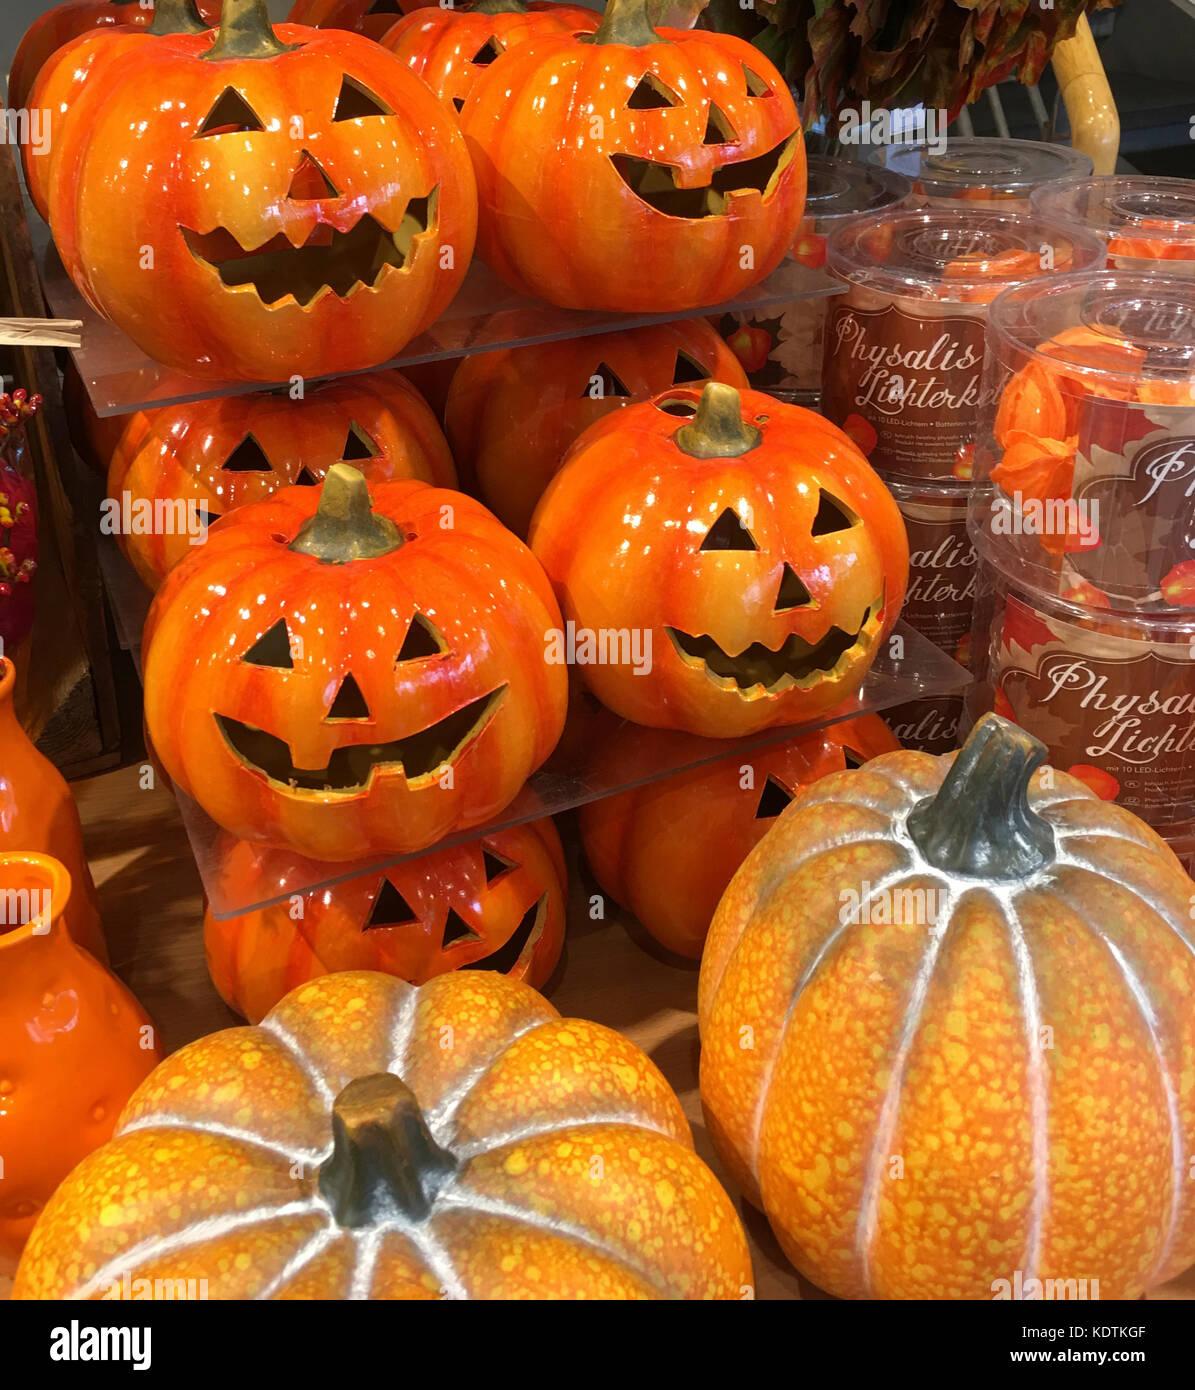 Halloween celebrations - jack-o-lantern and pumpkins - Stock Image